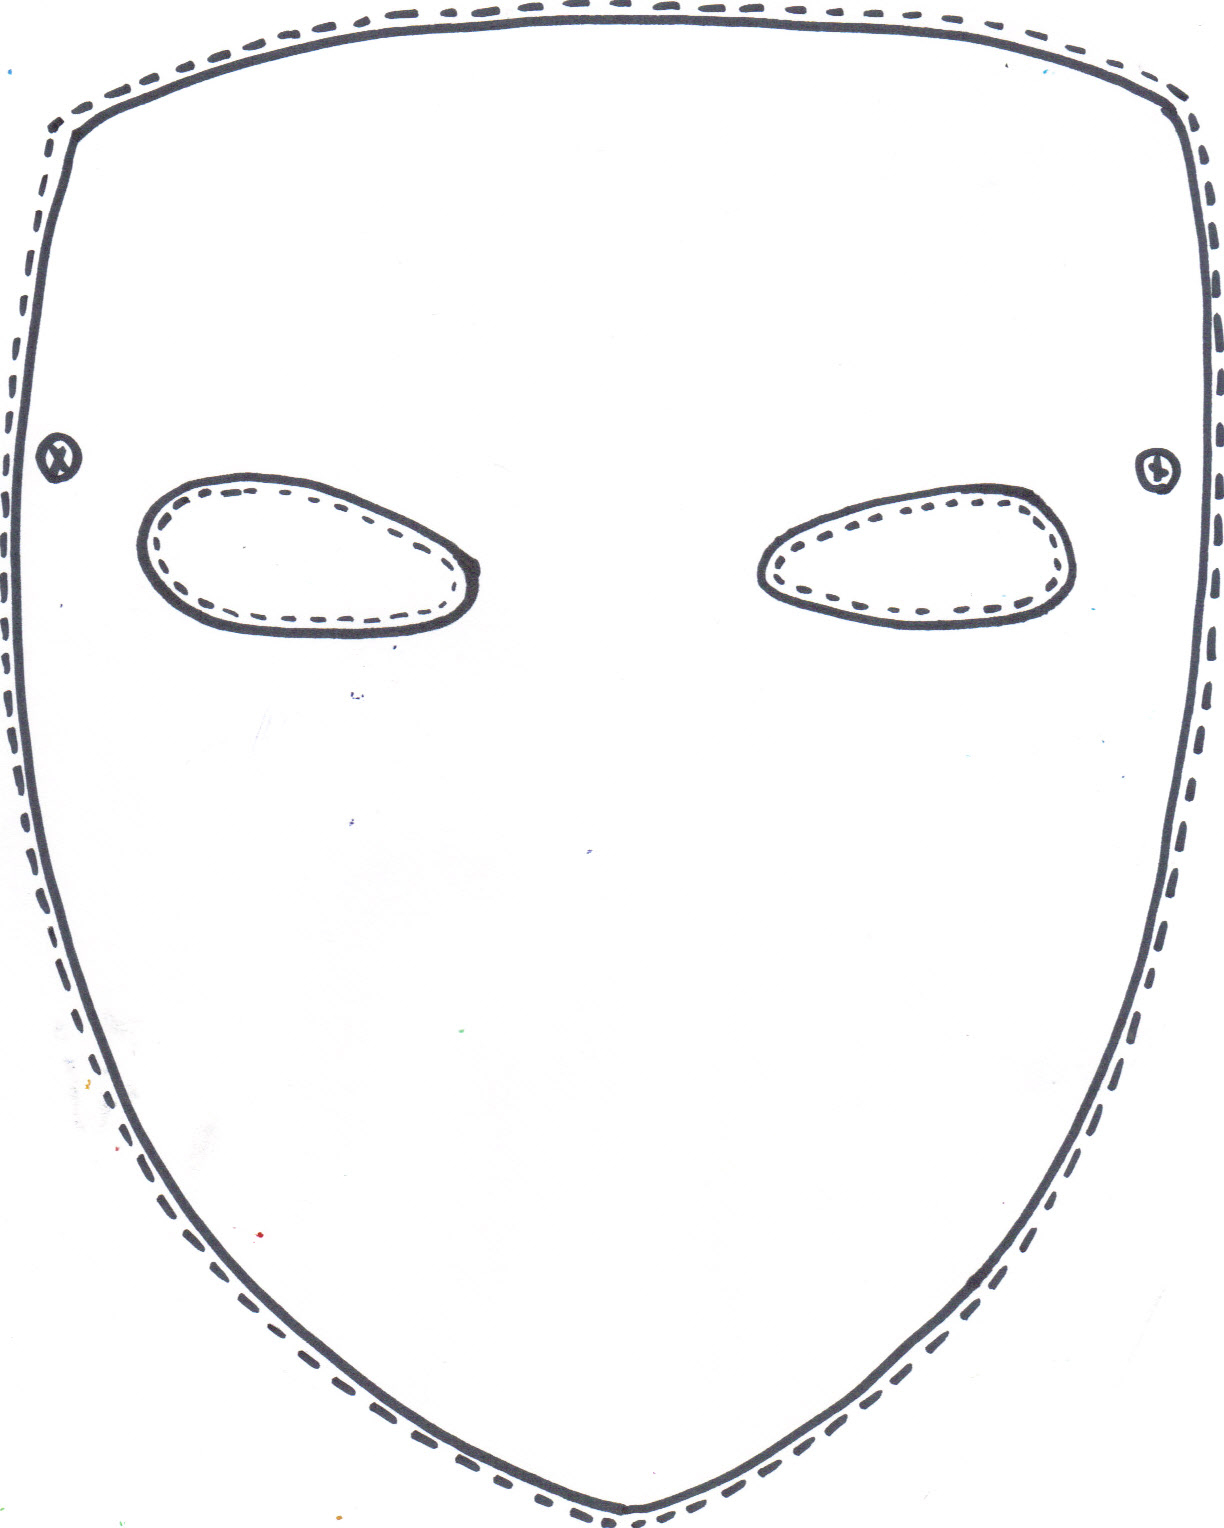 Last Minute Halloween Quickie: 100 Free Printable Masks A«  Face - Free Printable Face Masks